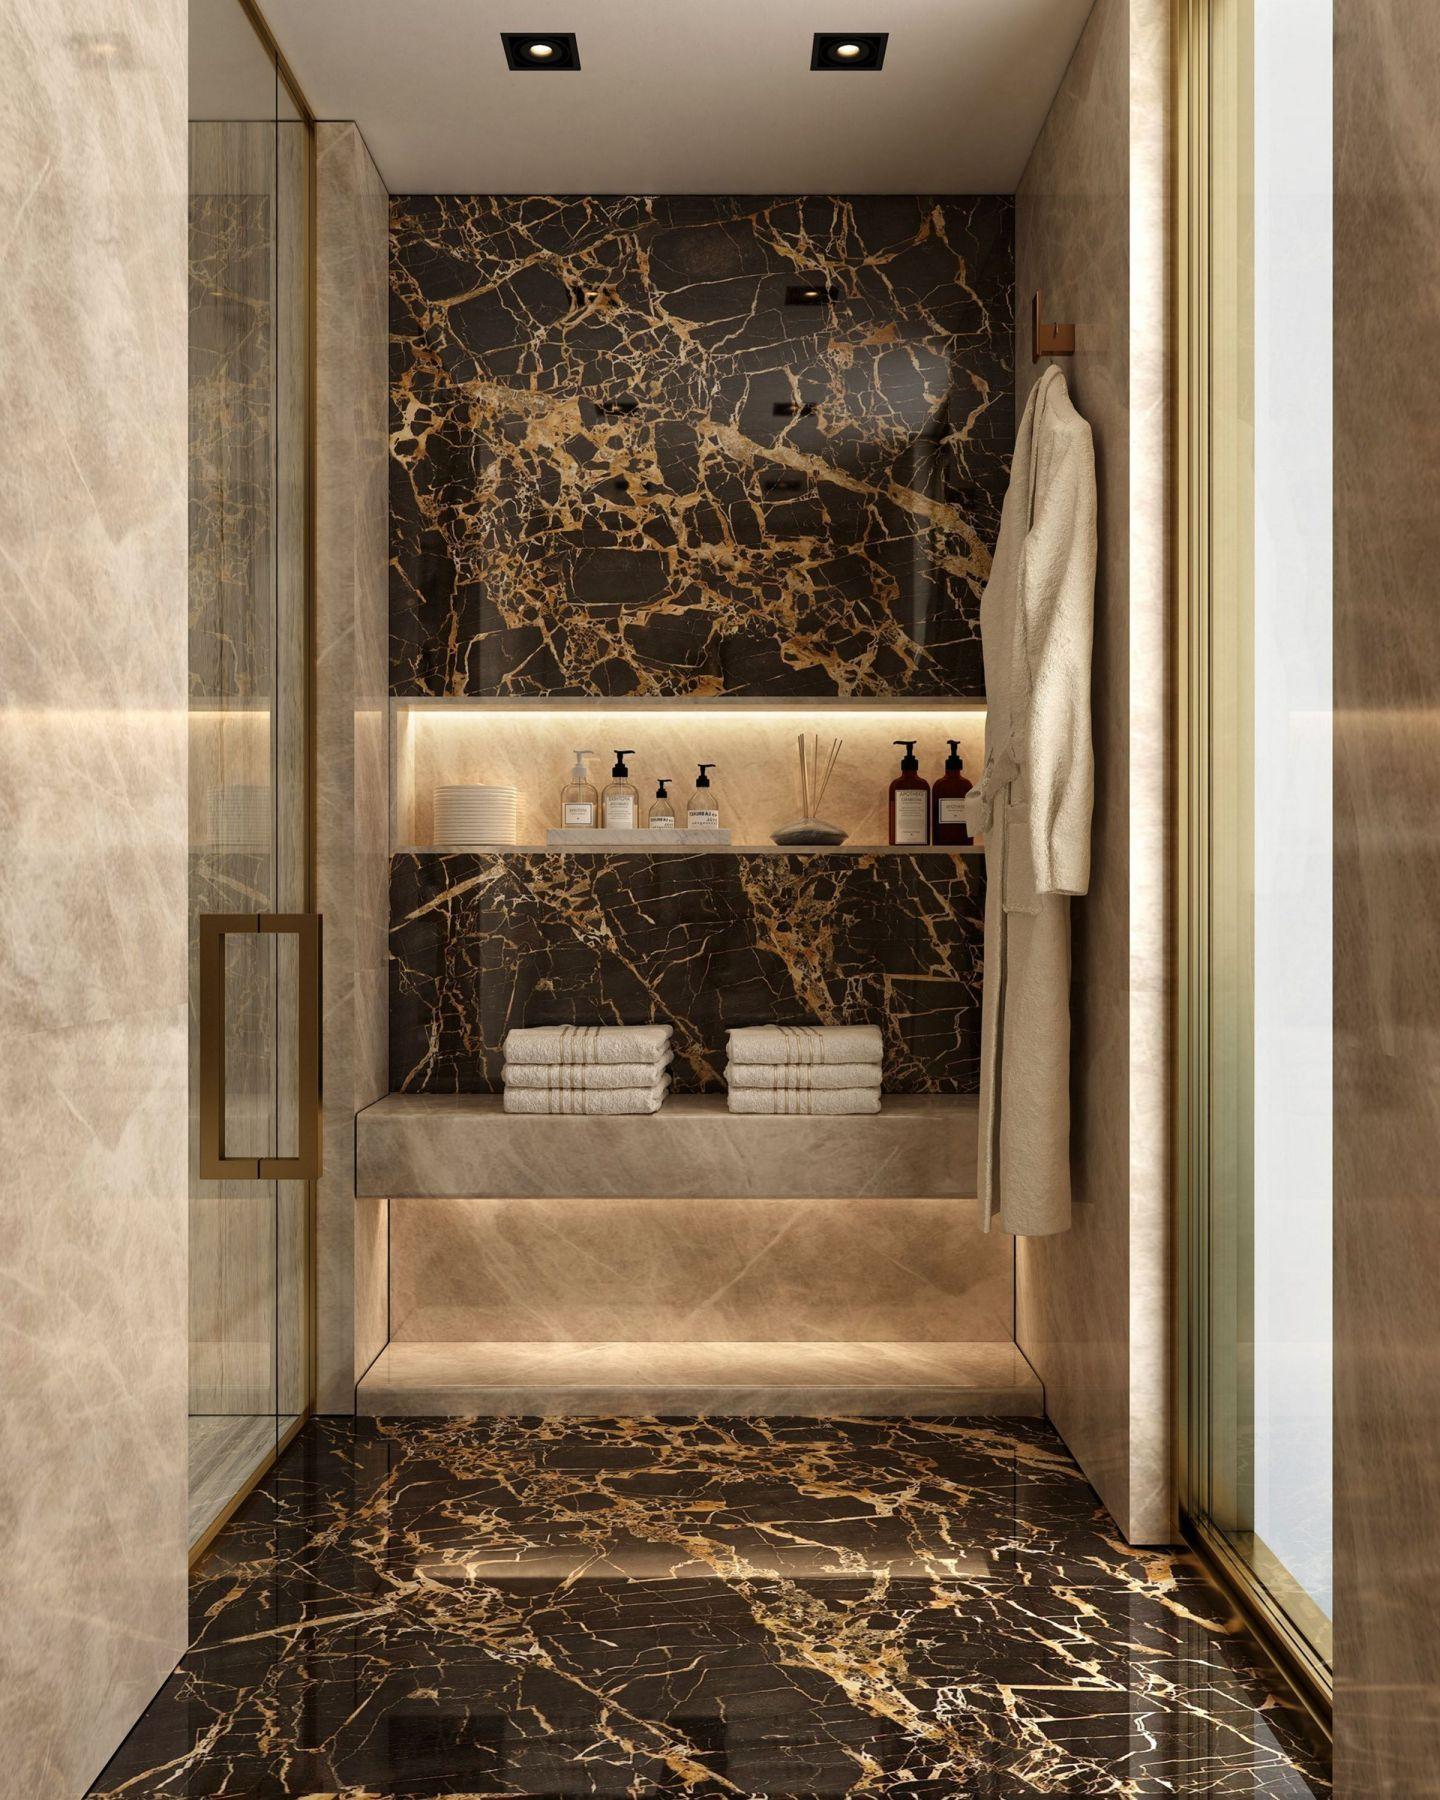 30 Glamorous Bathroom Design Ideas You Never Seen Before